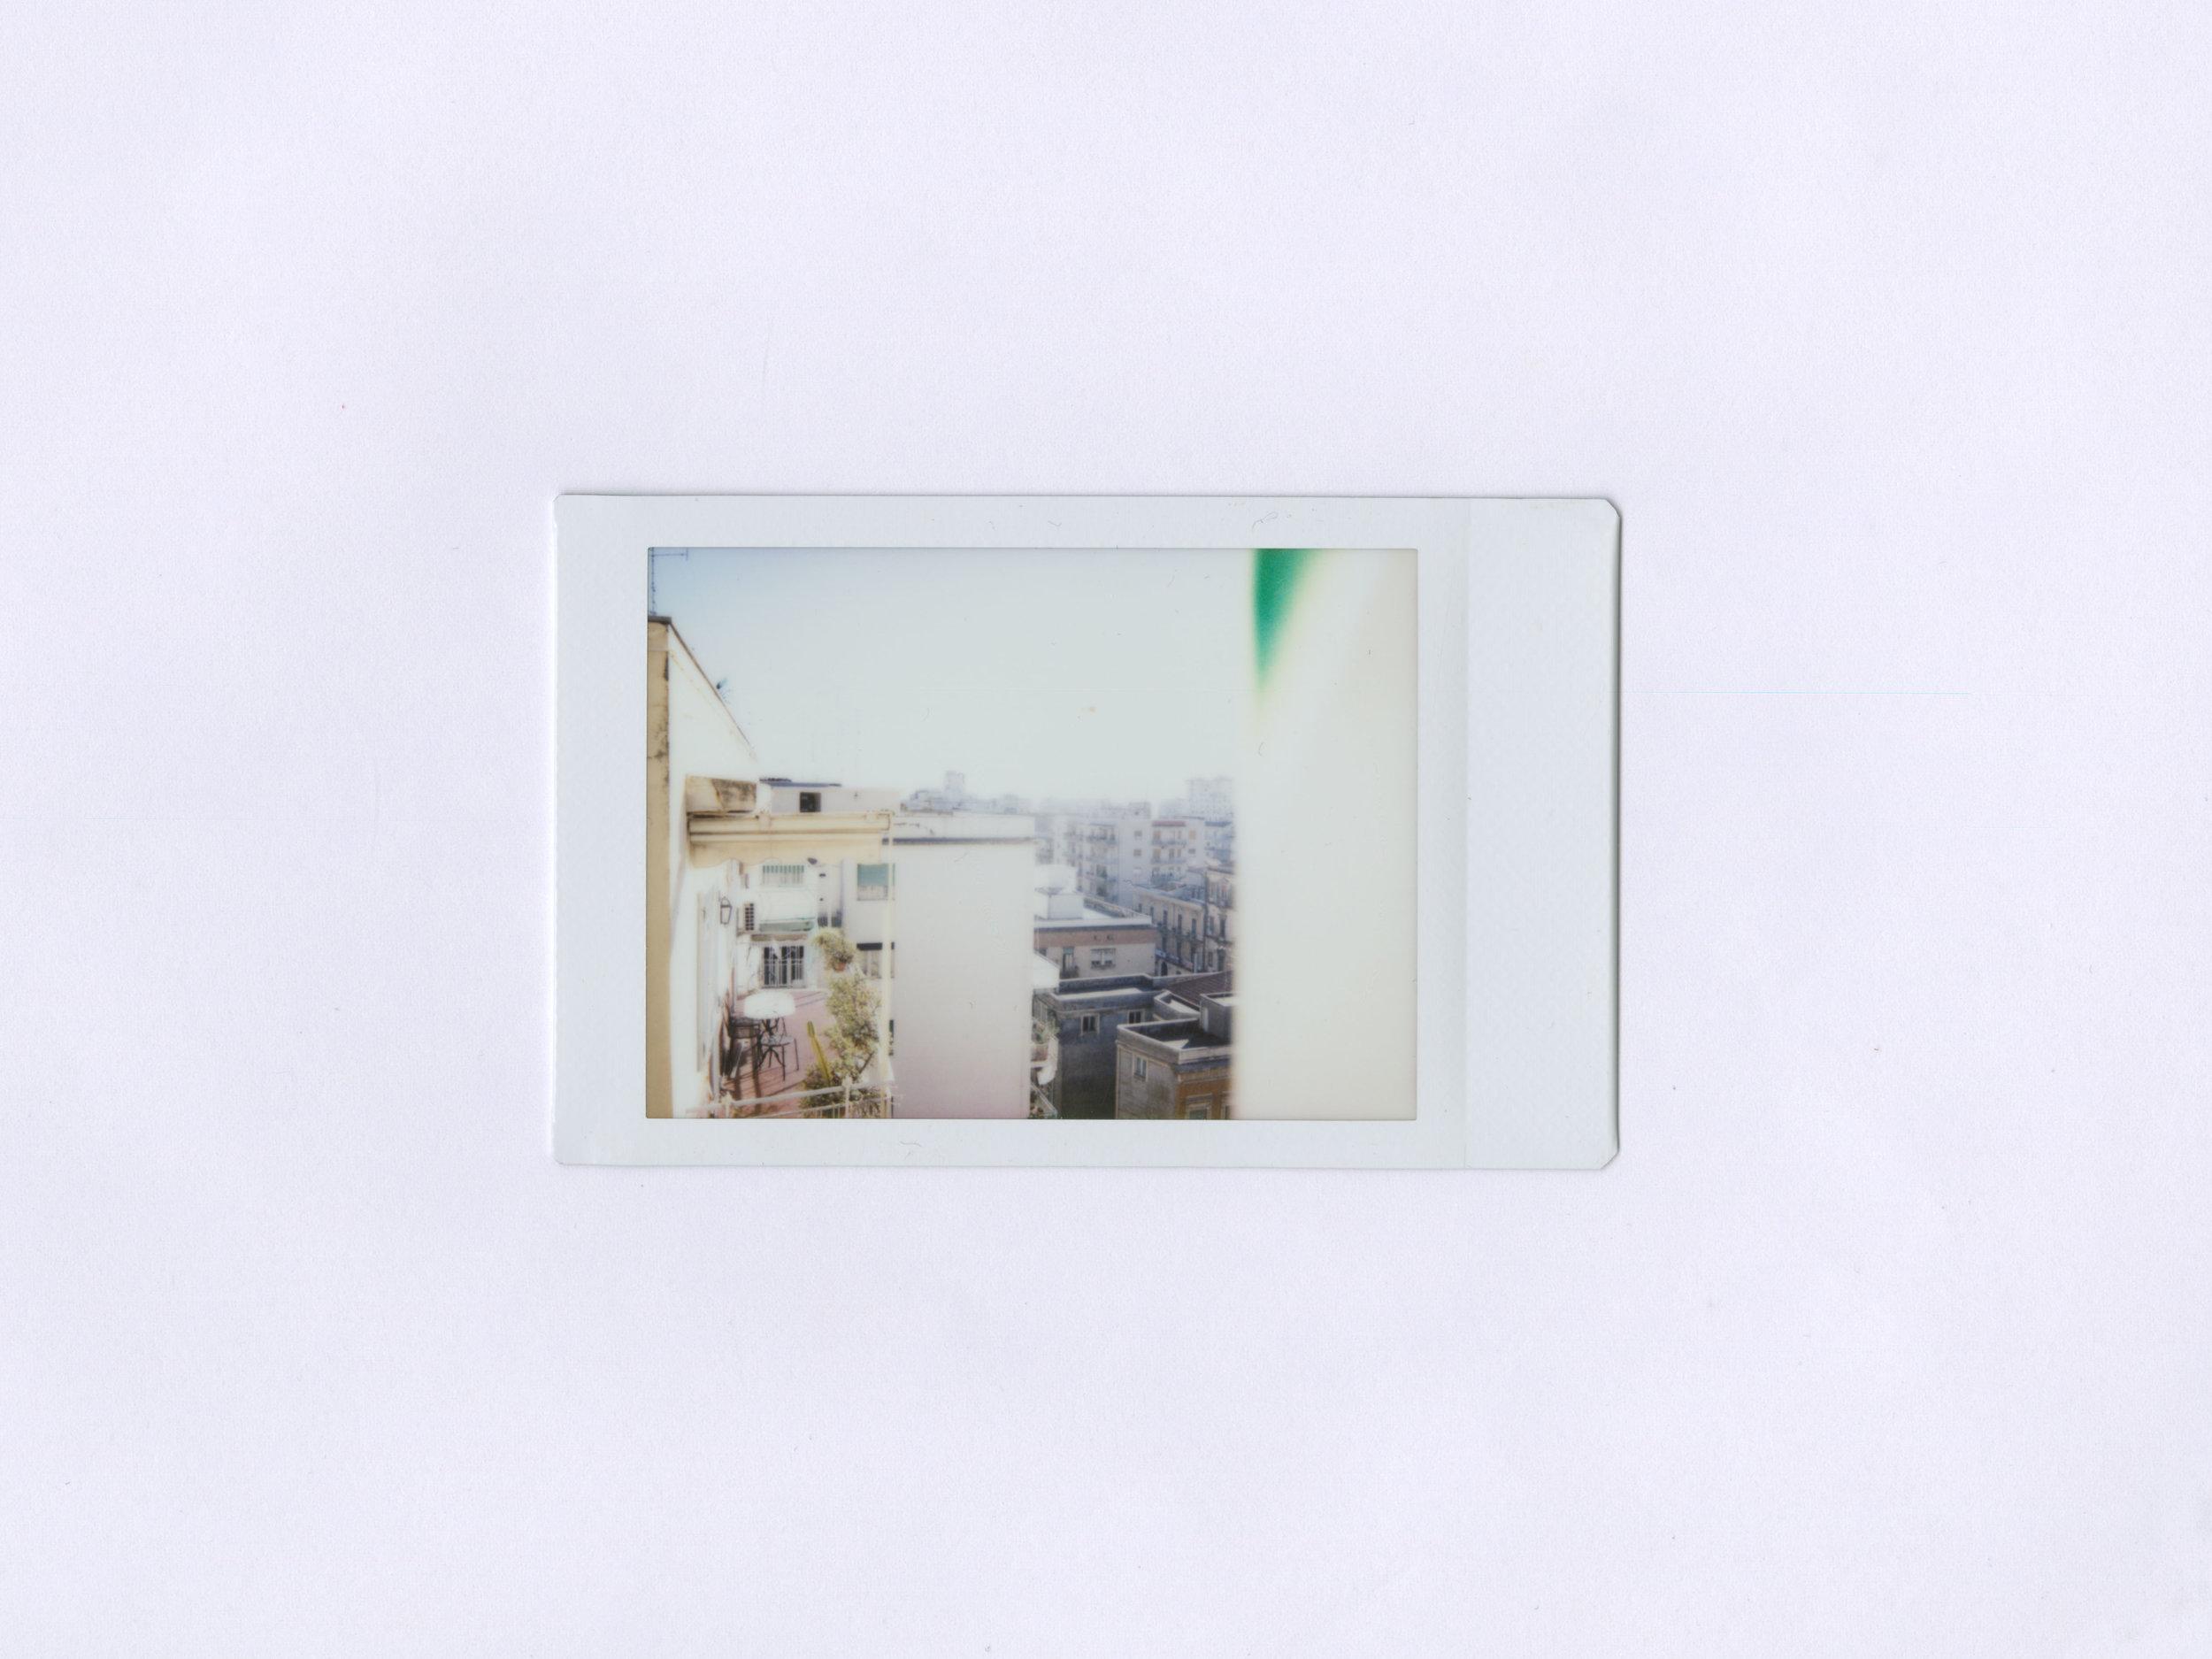 1.fdc181.jpg